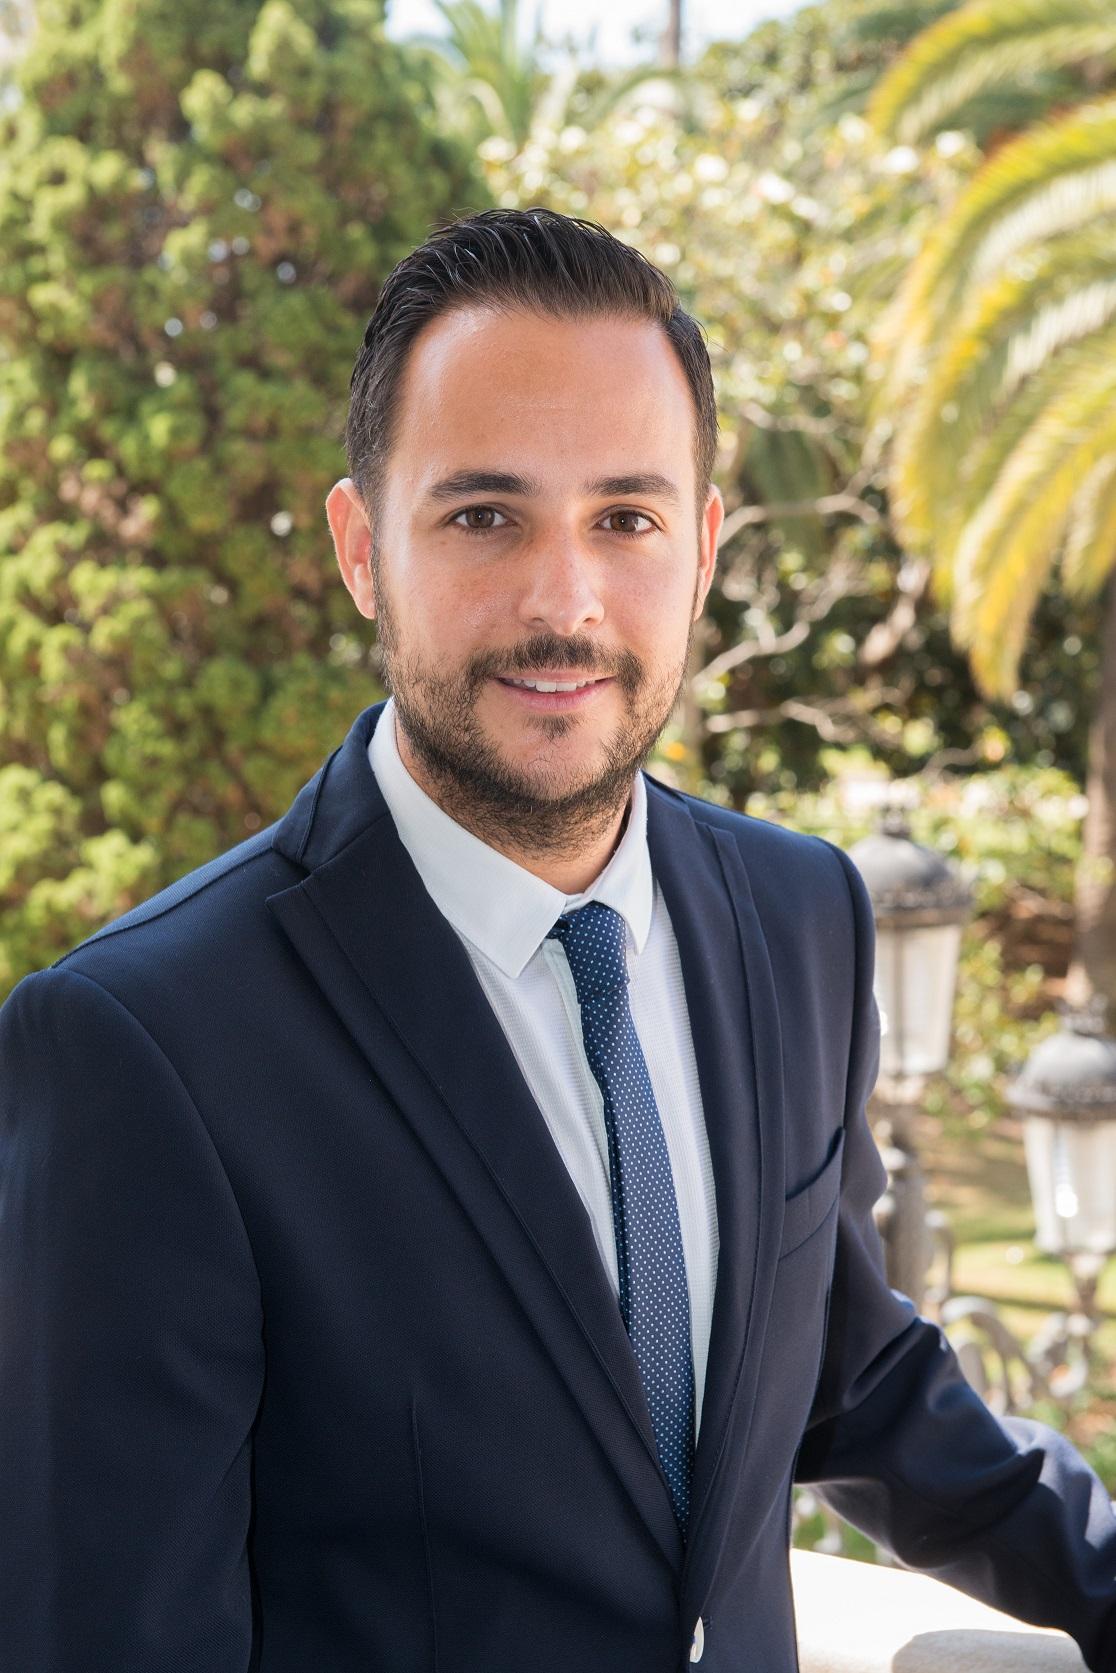 Sr. D. David Martínez Noguera